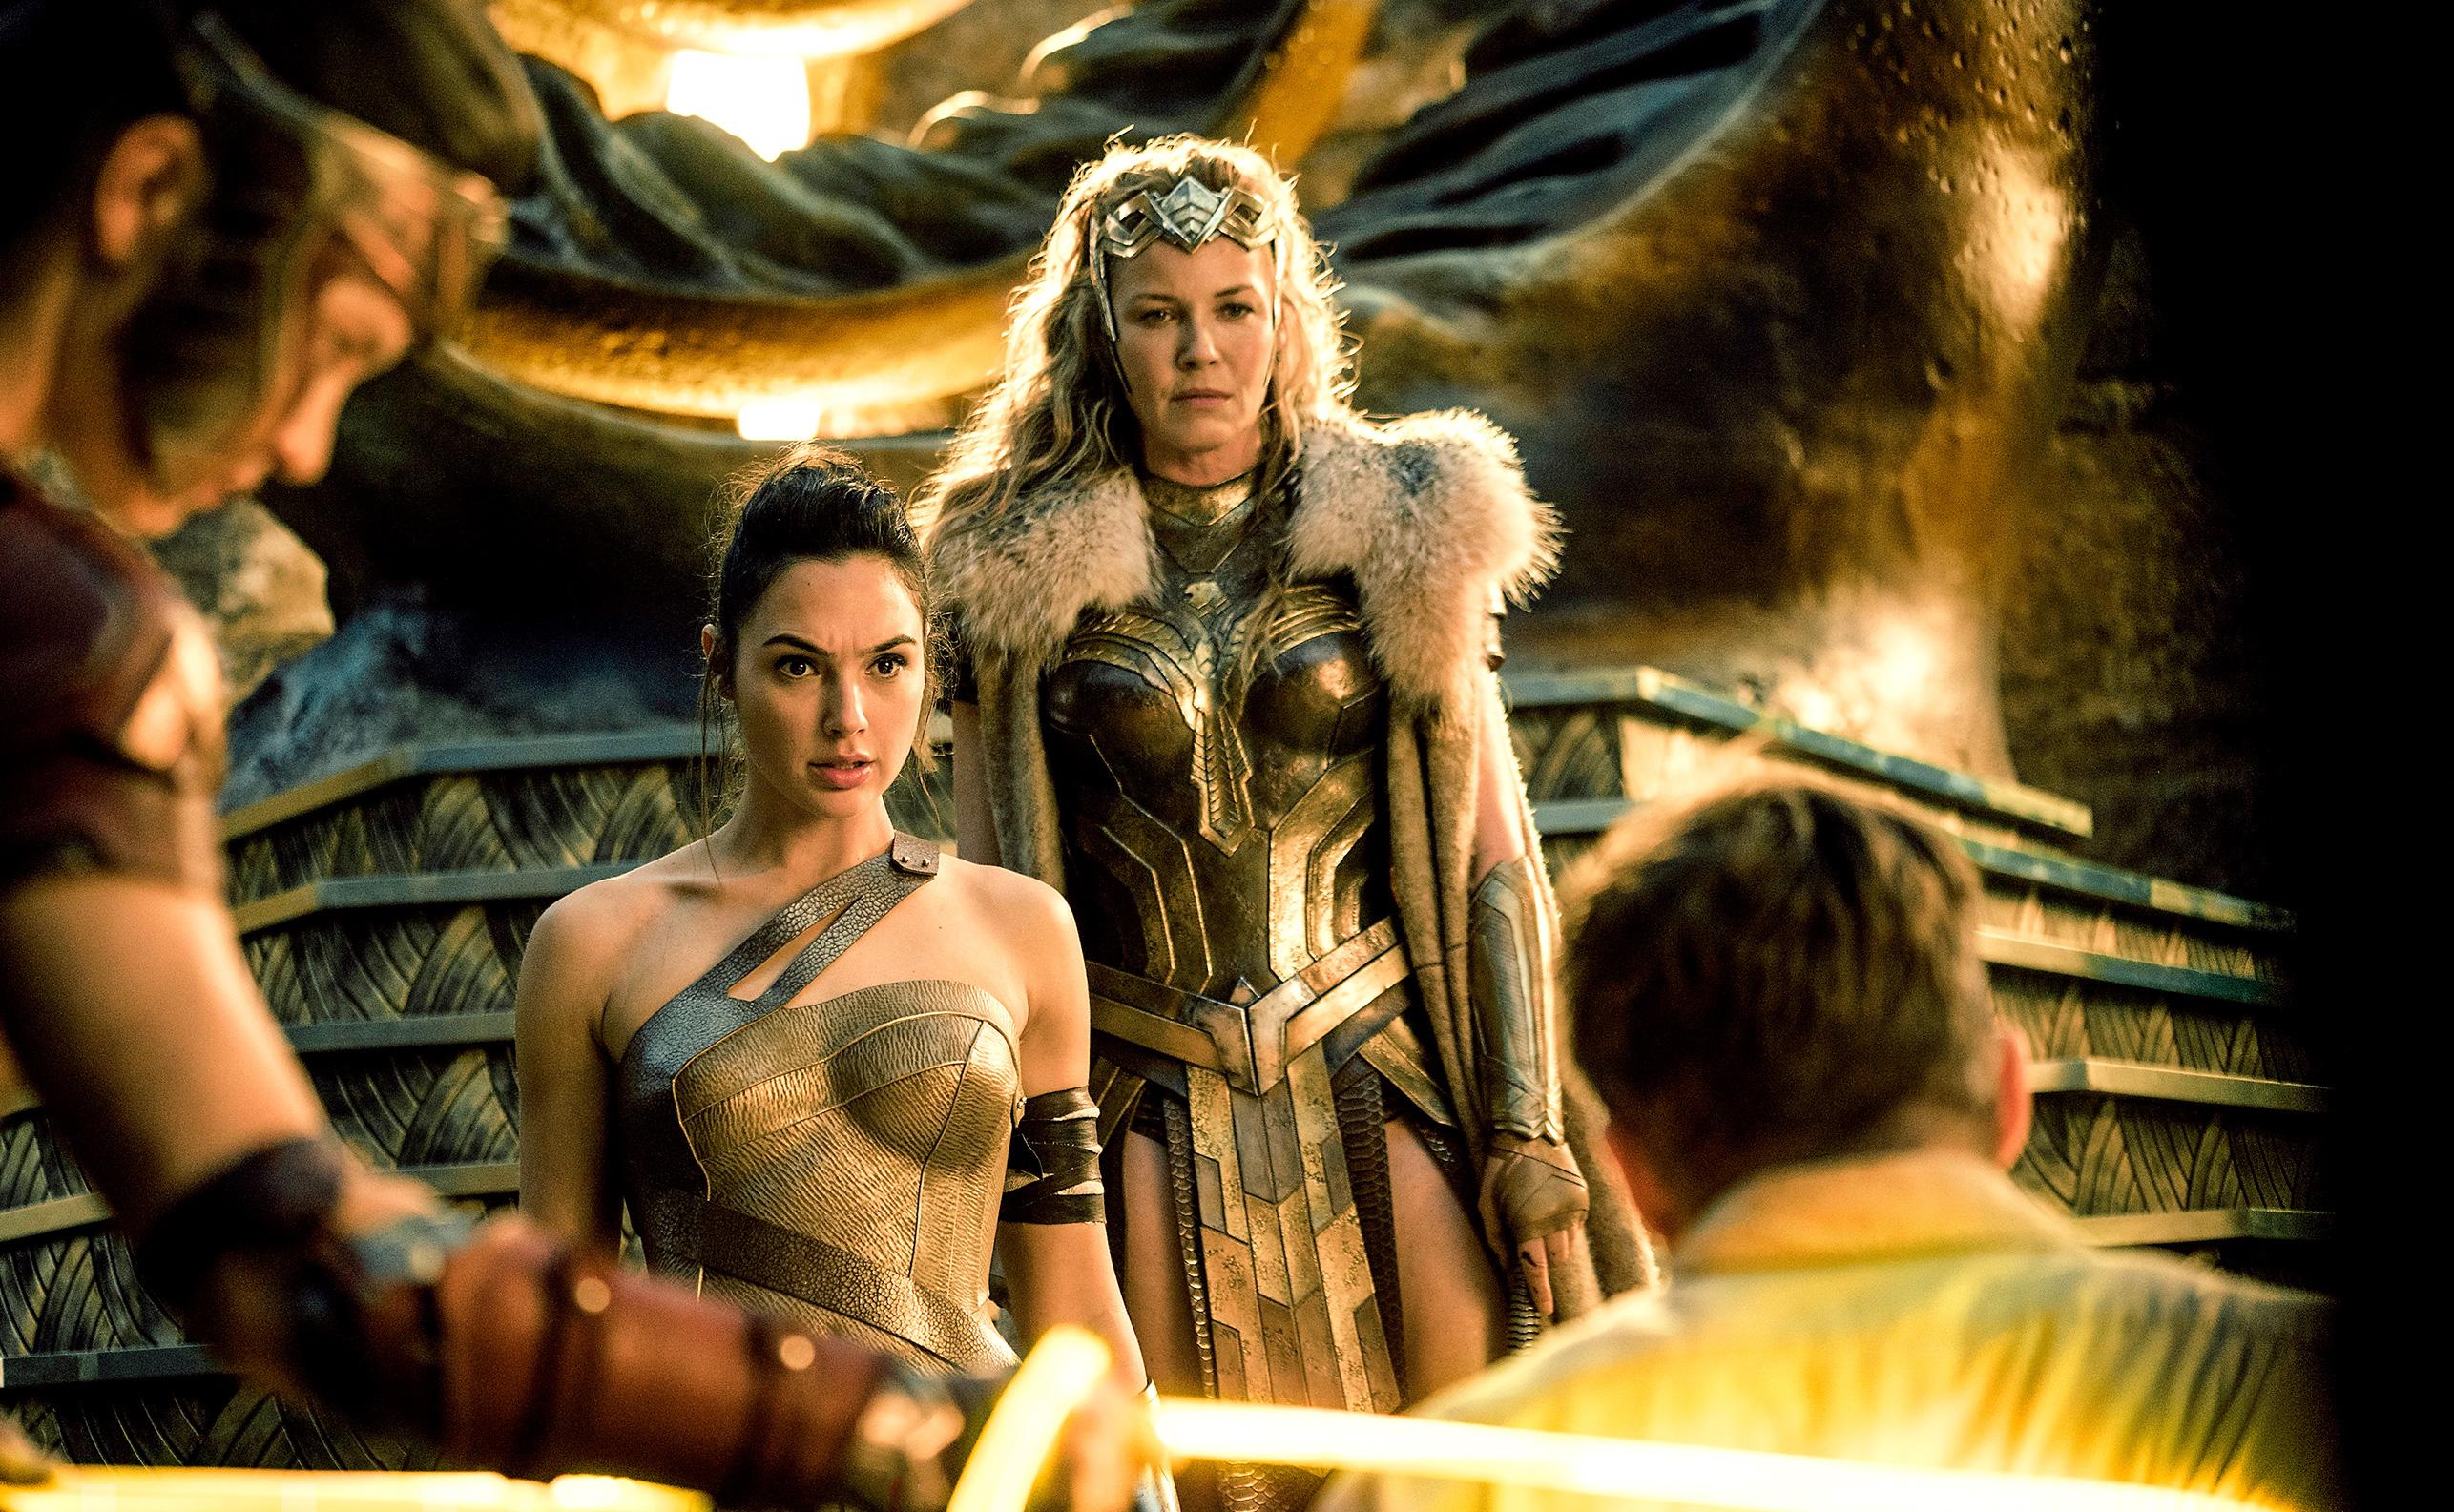 Gal Gadot Wonder Woman New 4k Hd Movies 4k Wallpapers: Wonder Woman Gal Gadot Connie Nielsen, HD Movies, 4k